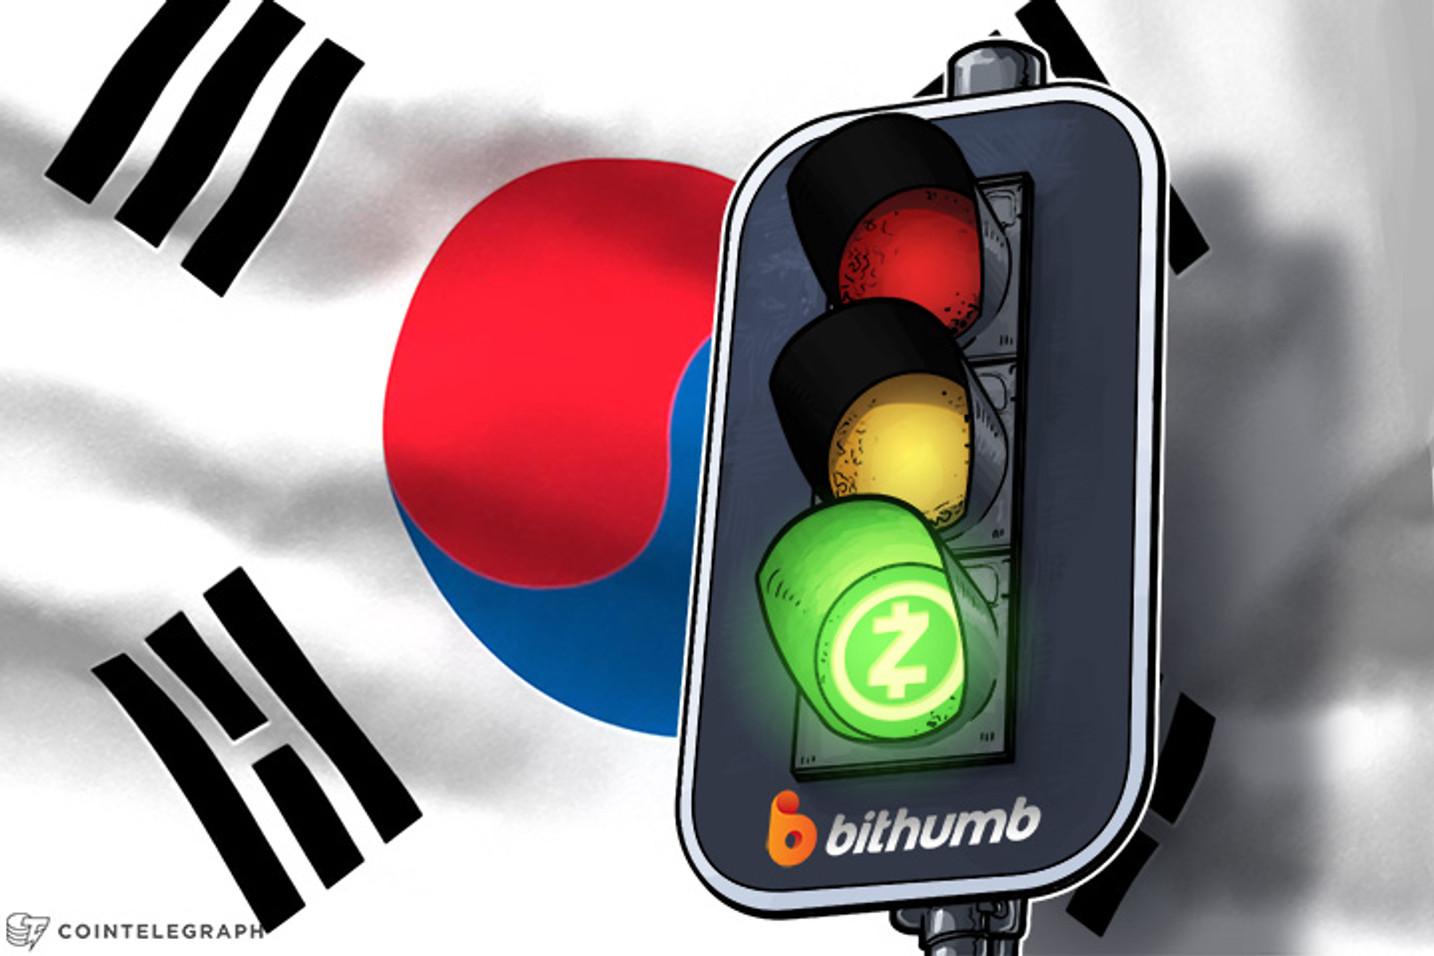 Despite Korean 'Ban', Bithumb Adds Zcash